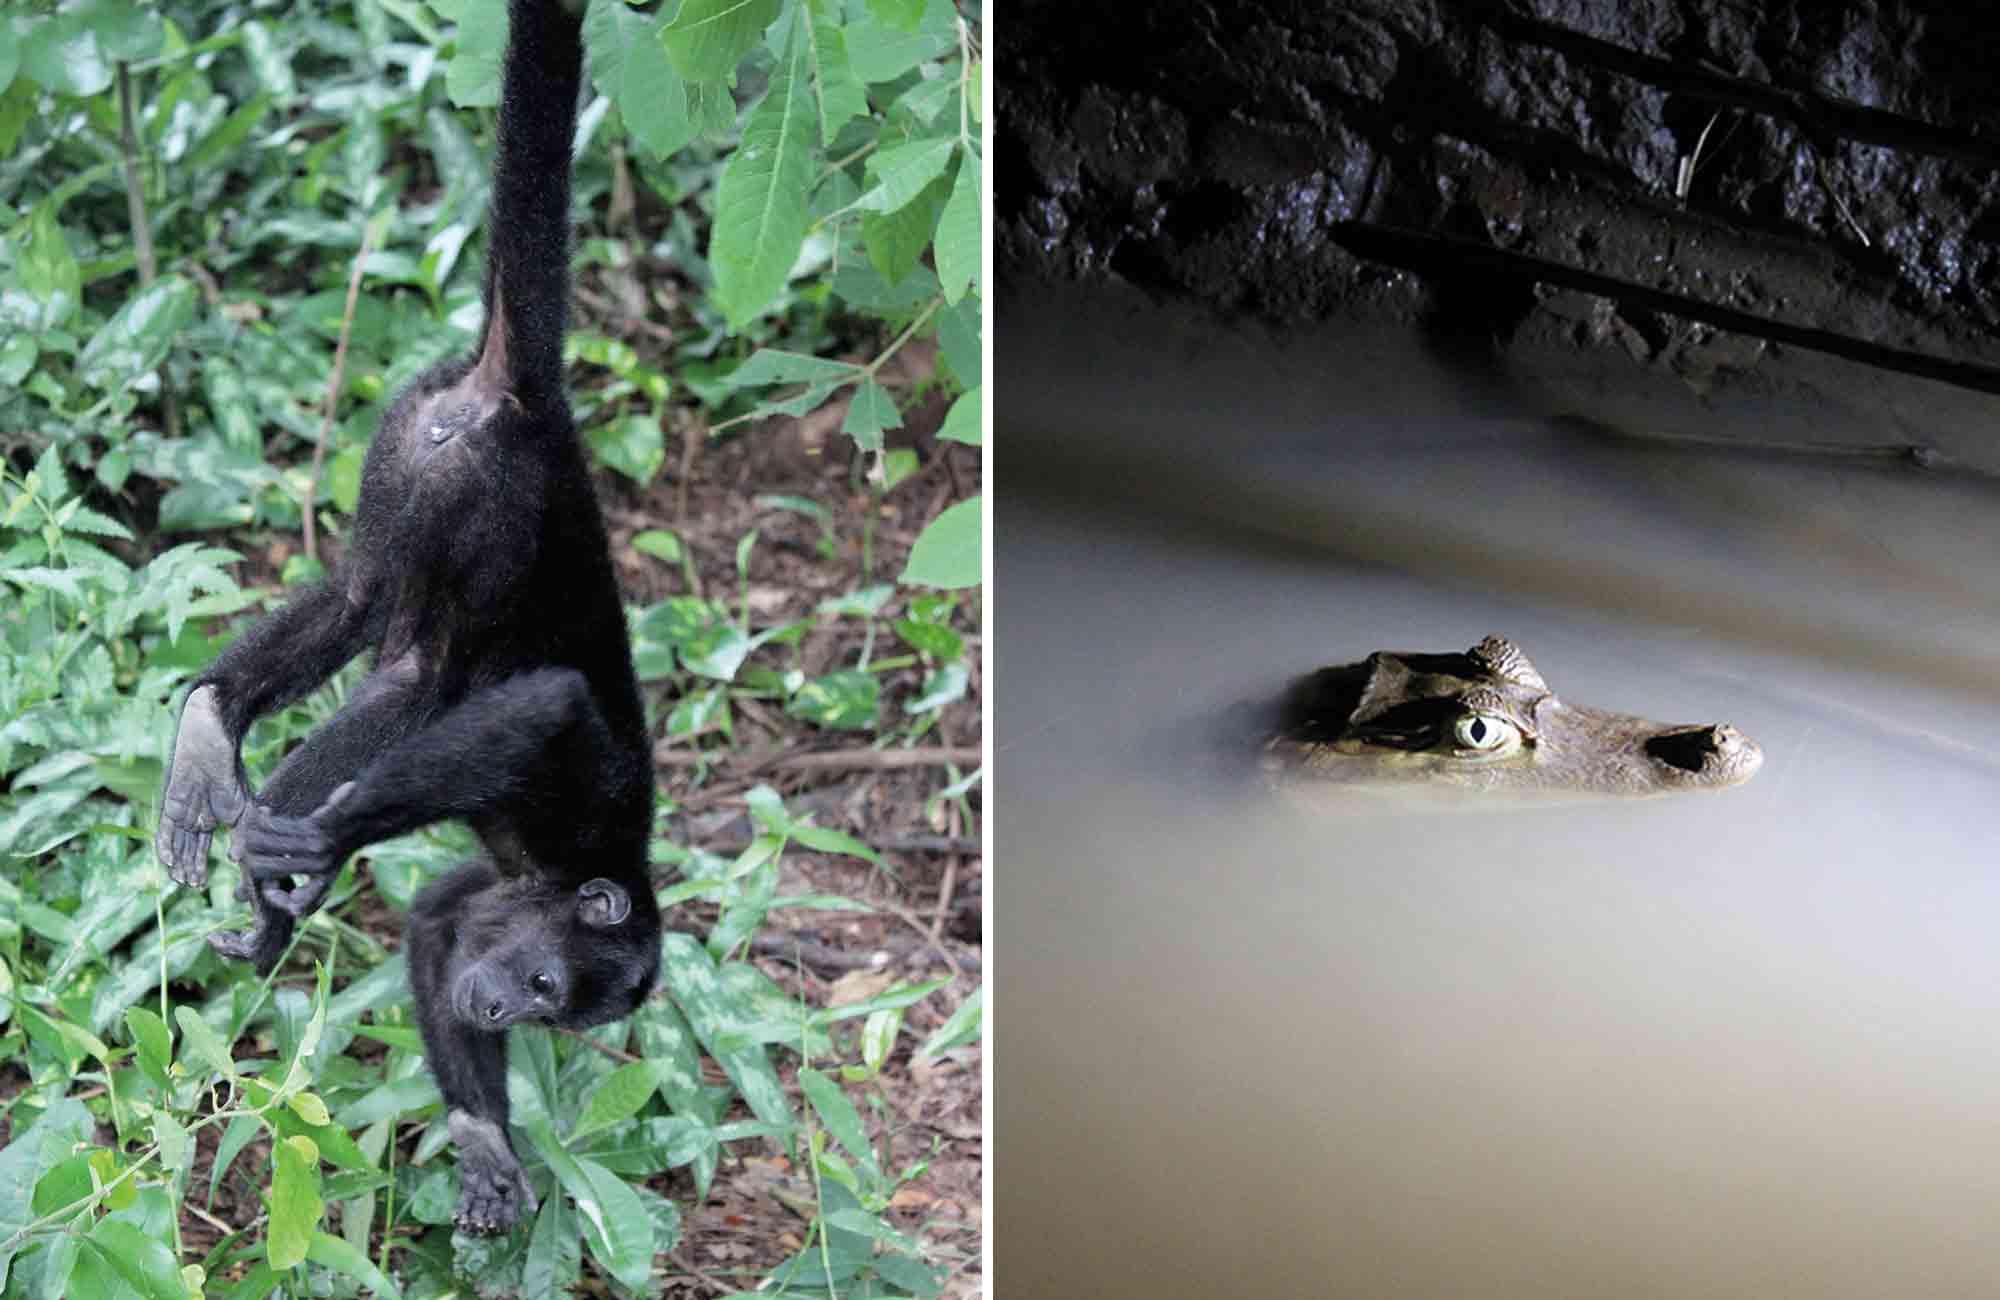 Voyage Pérou Costa Rica - singe hurleur et crocodile - Amplitudes